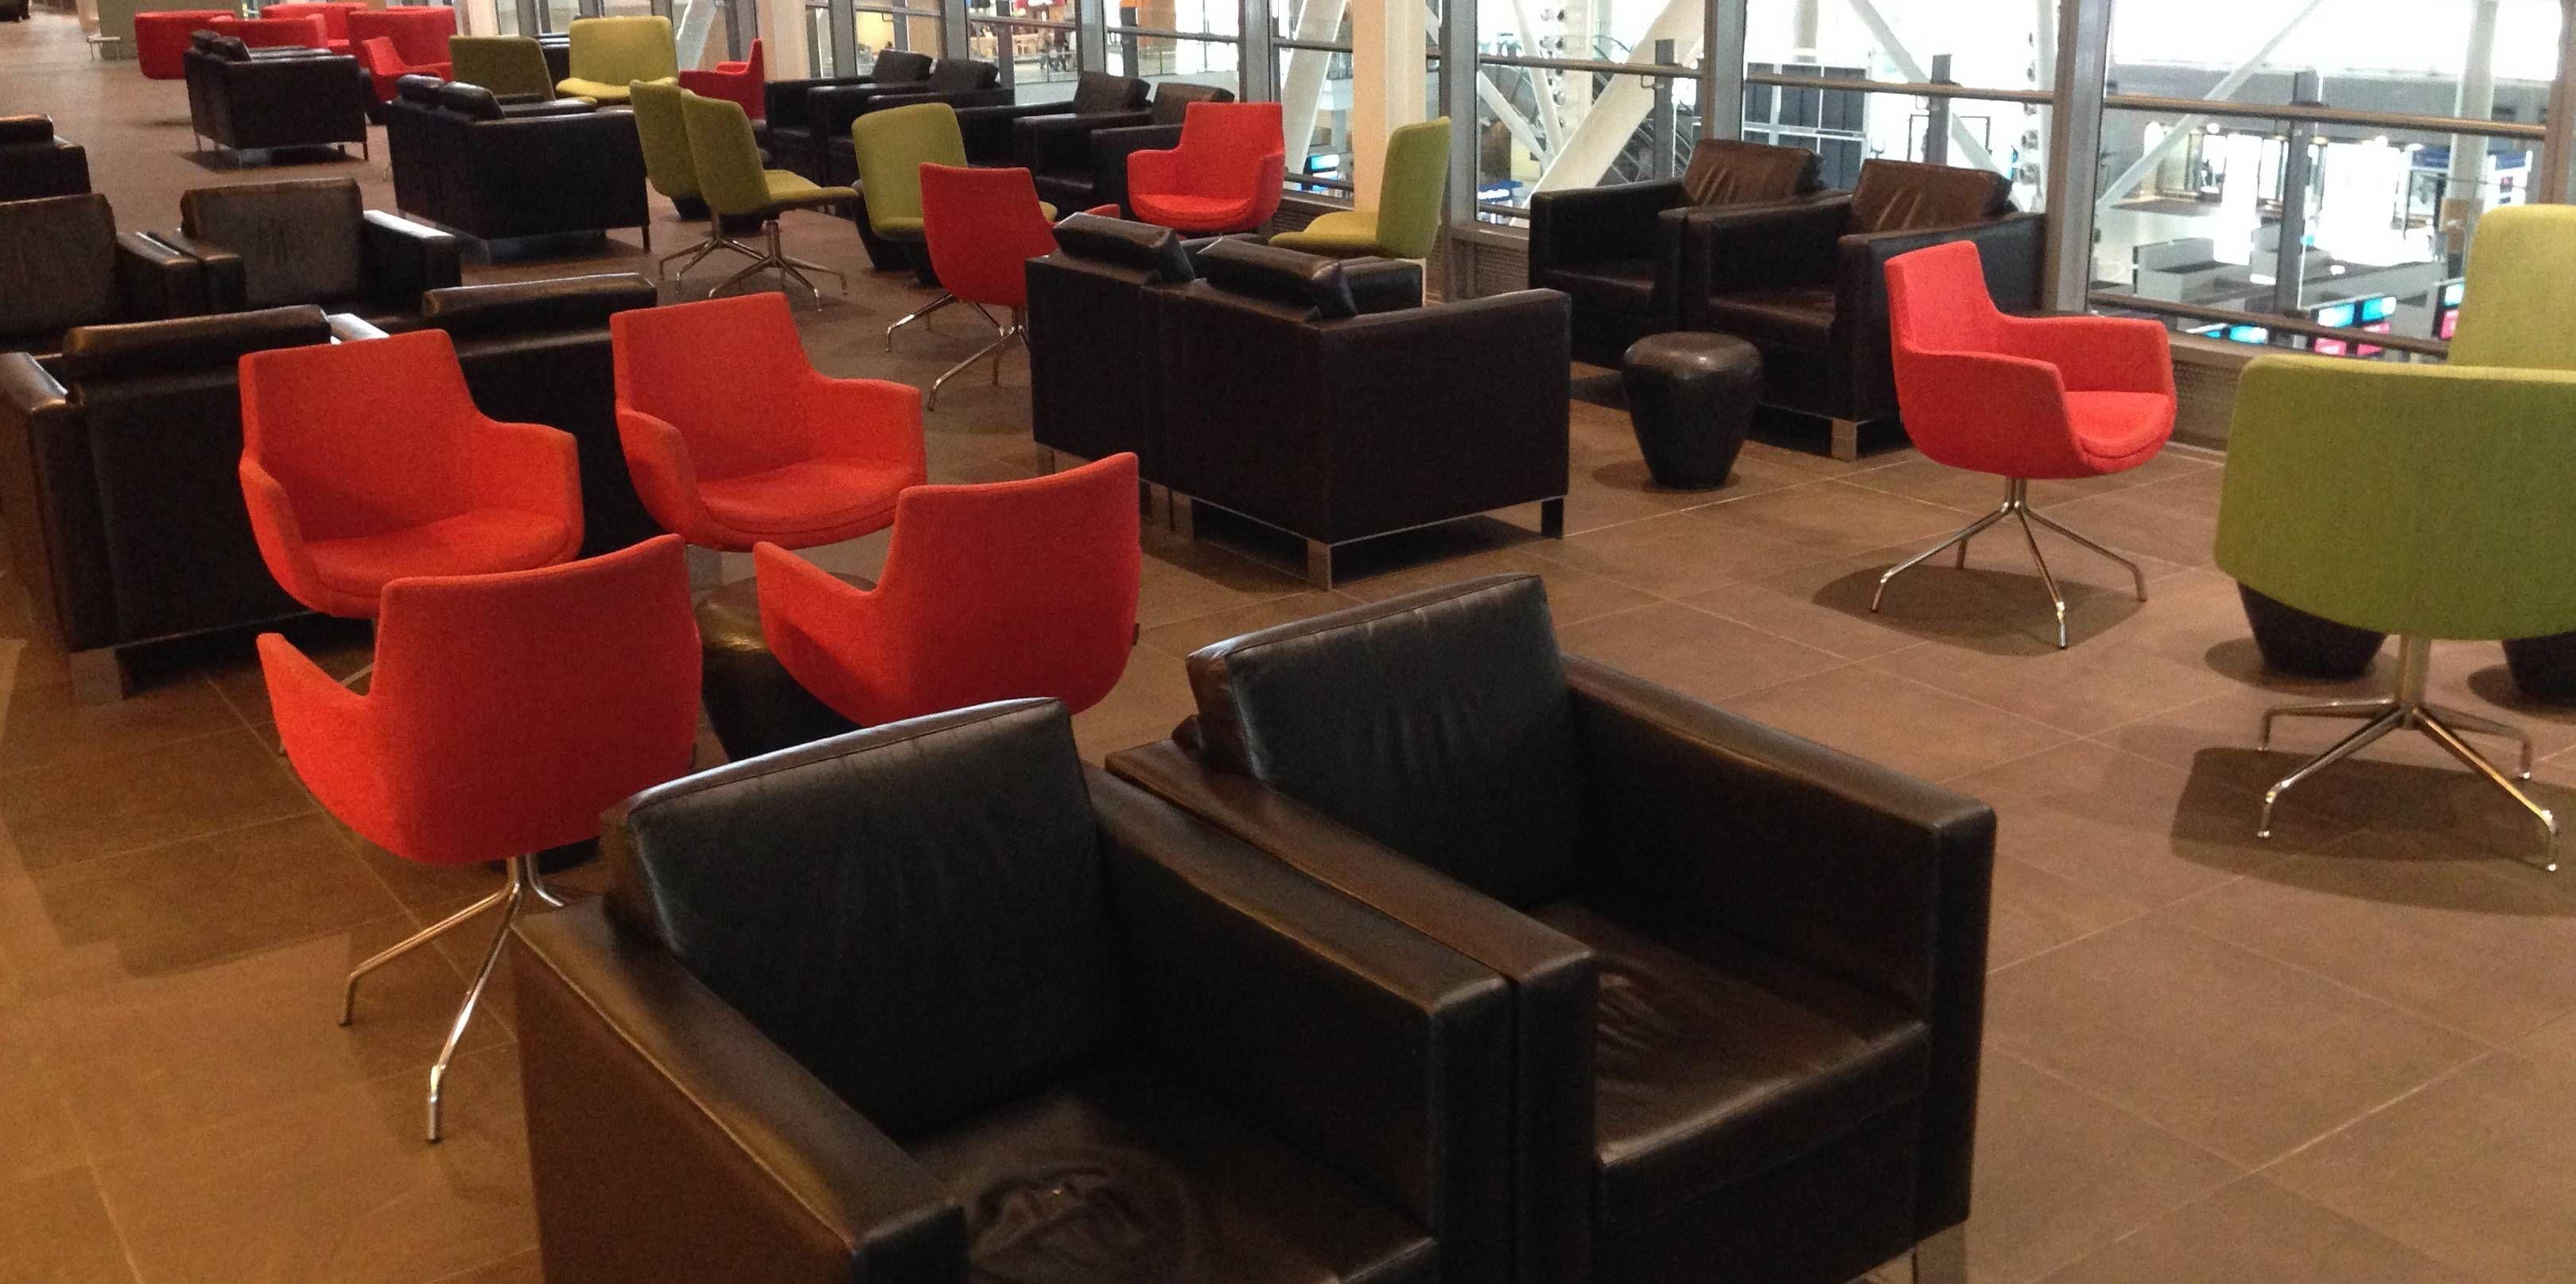 Premium Lounge South African Airways no Aeroporto de Cape Town (CPT)